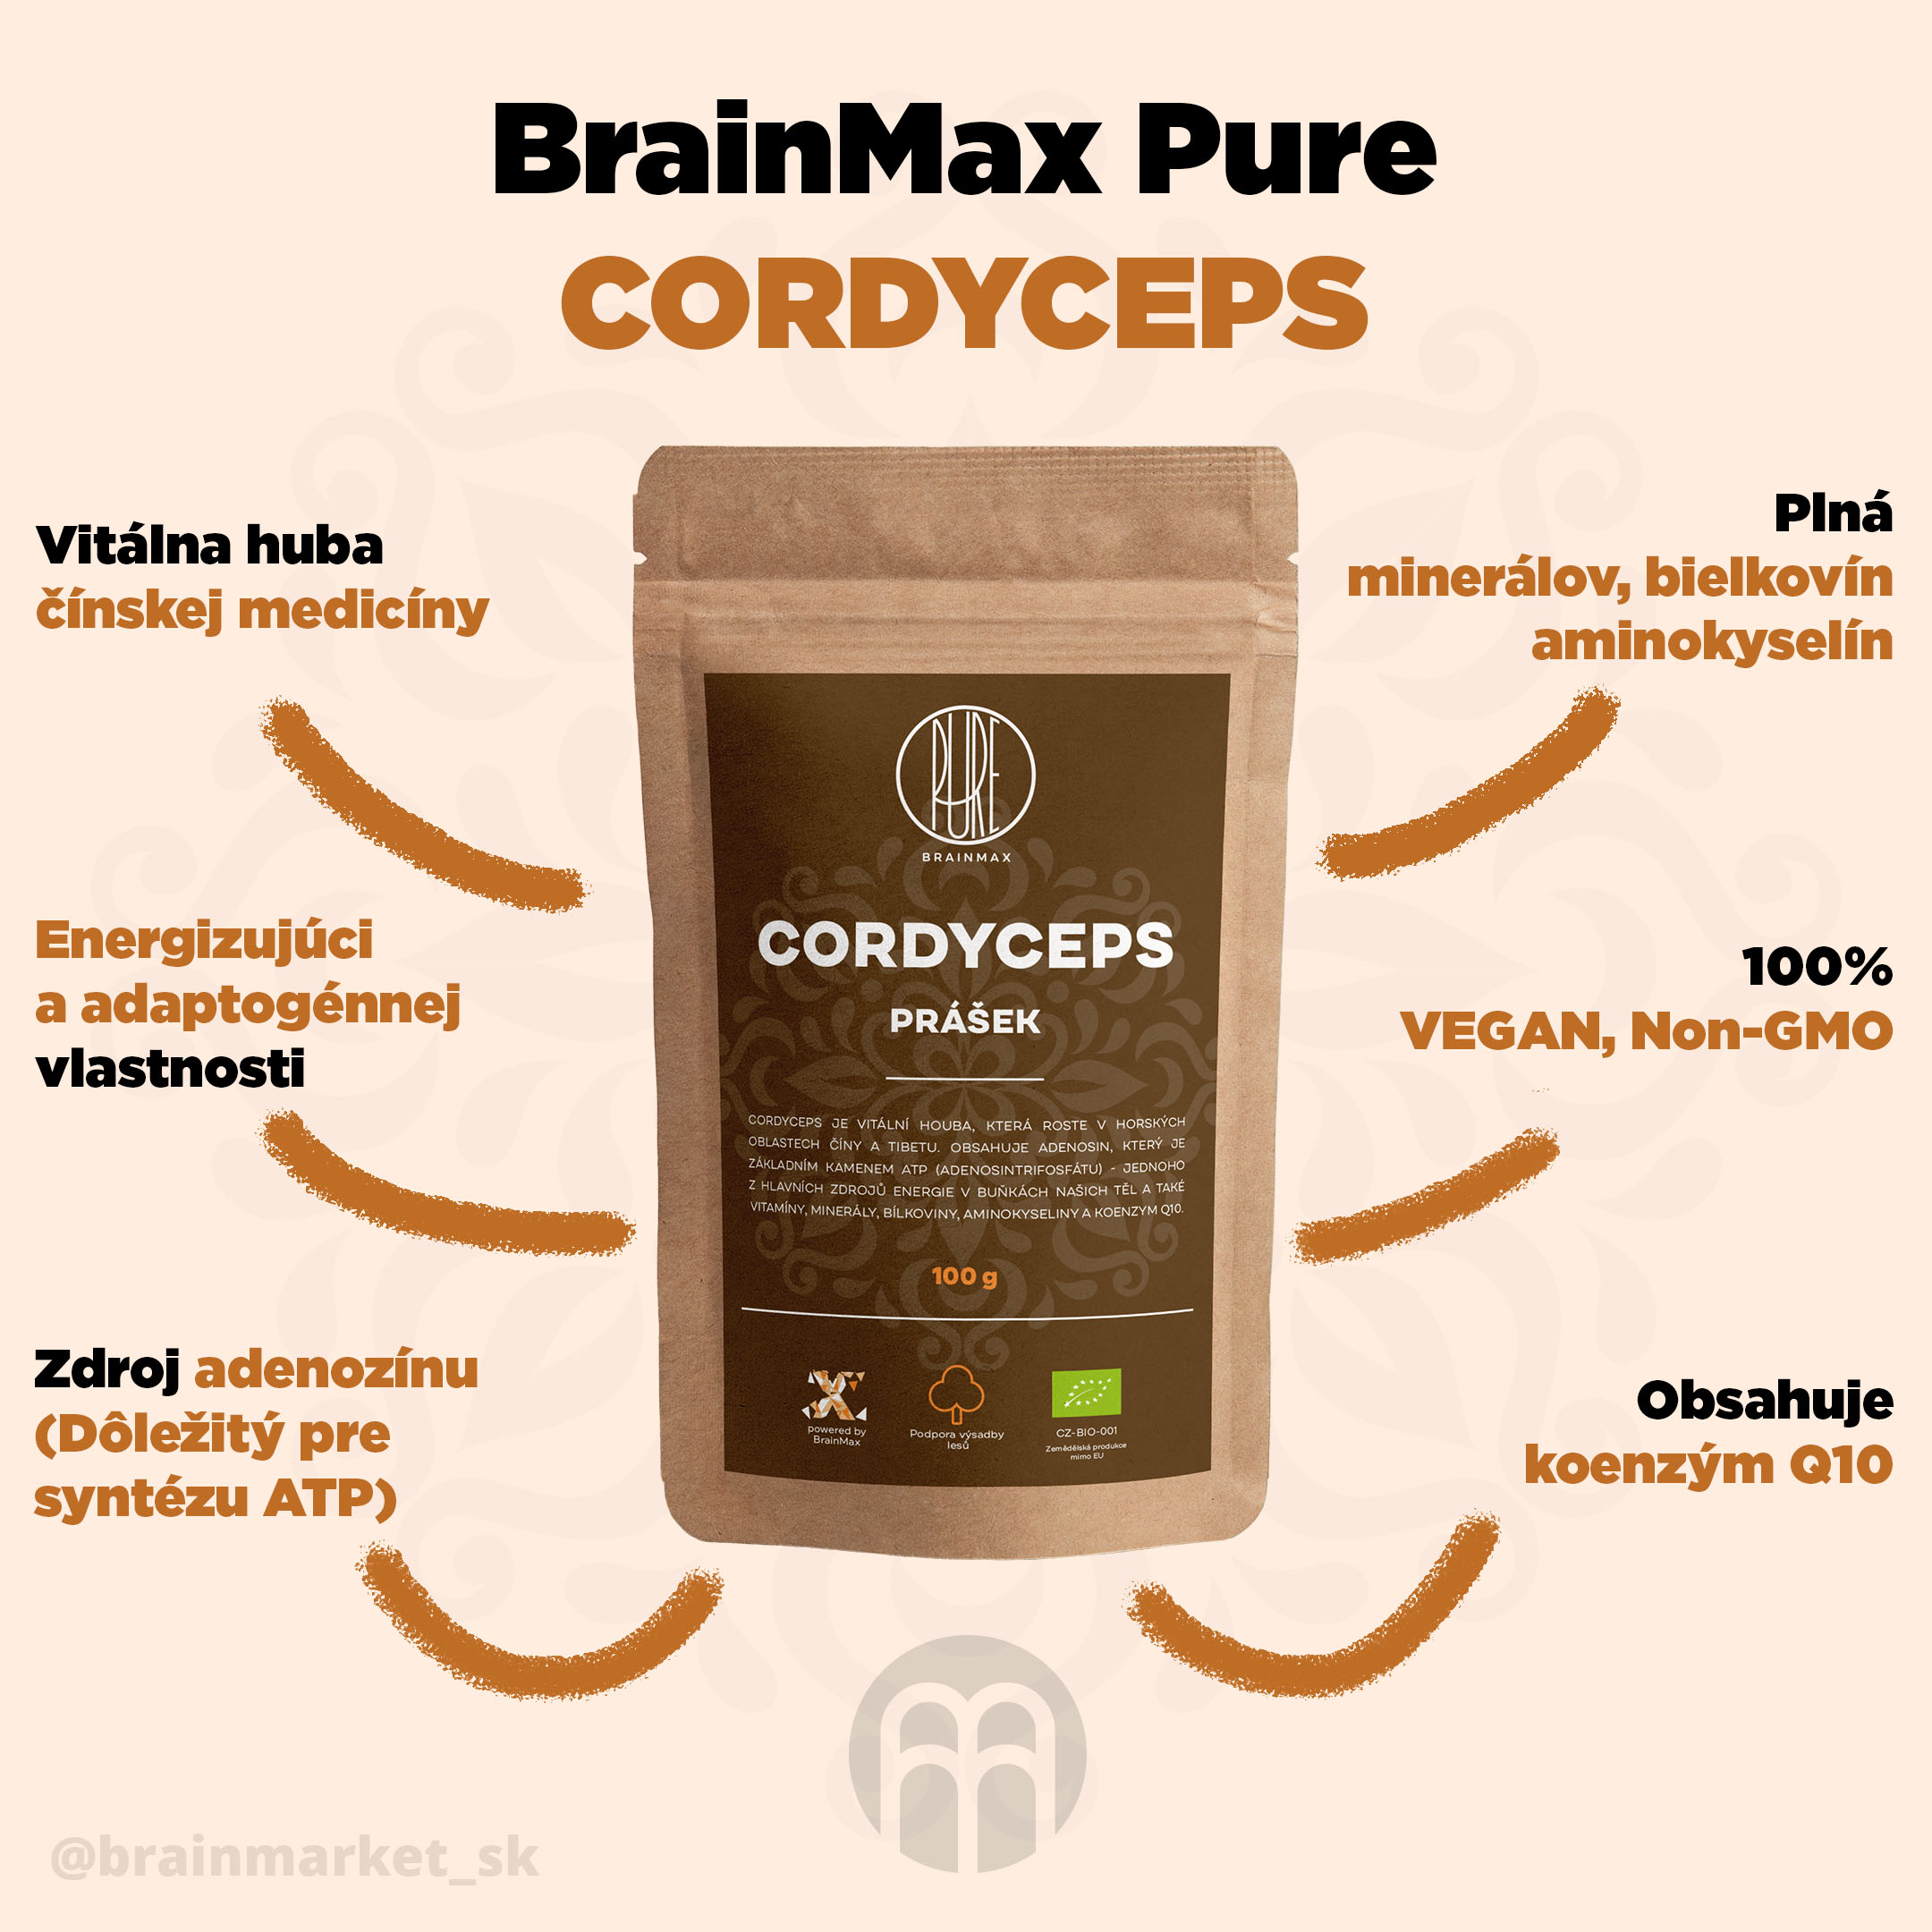 cordyceps_pavucina_infografik_brainmarket_sk